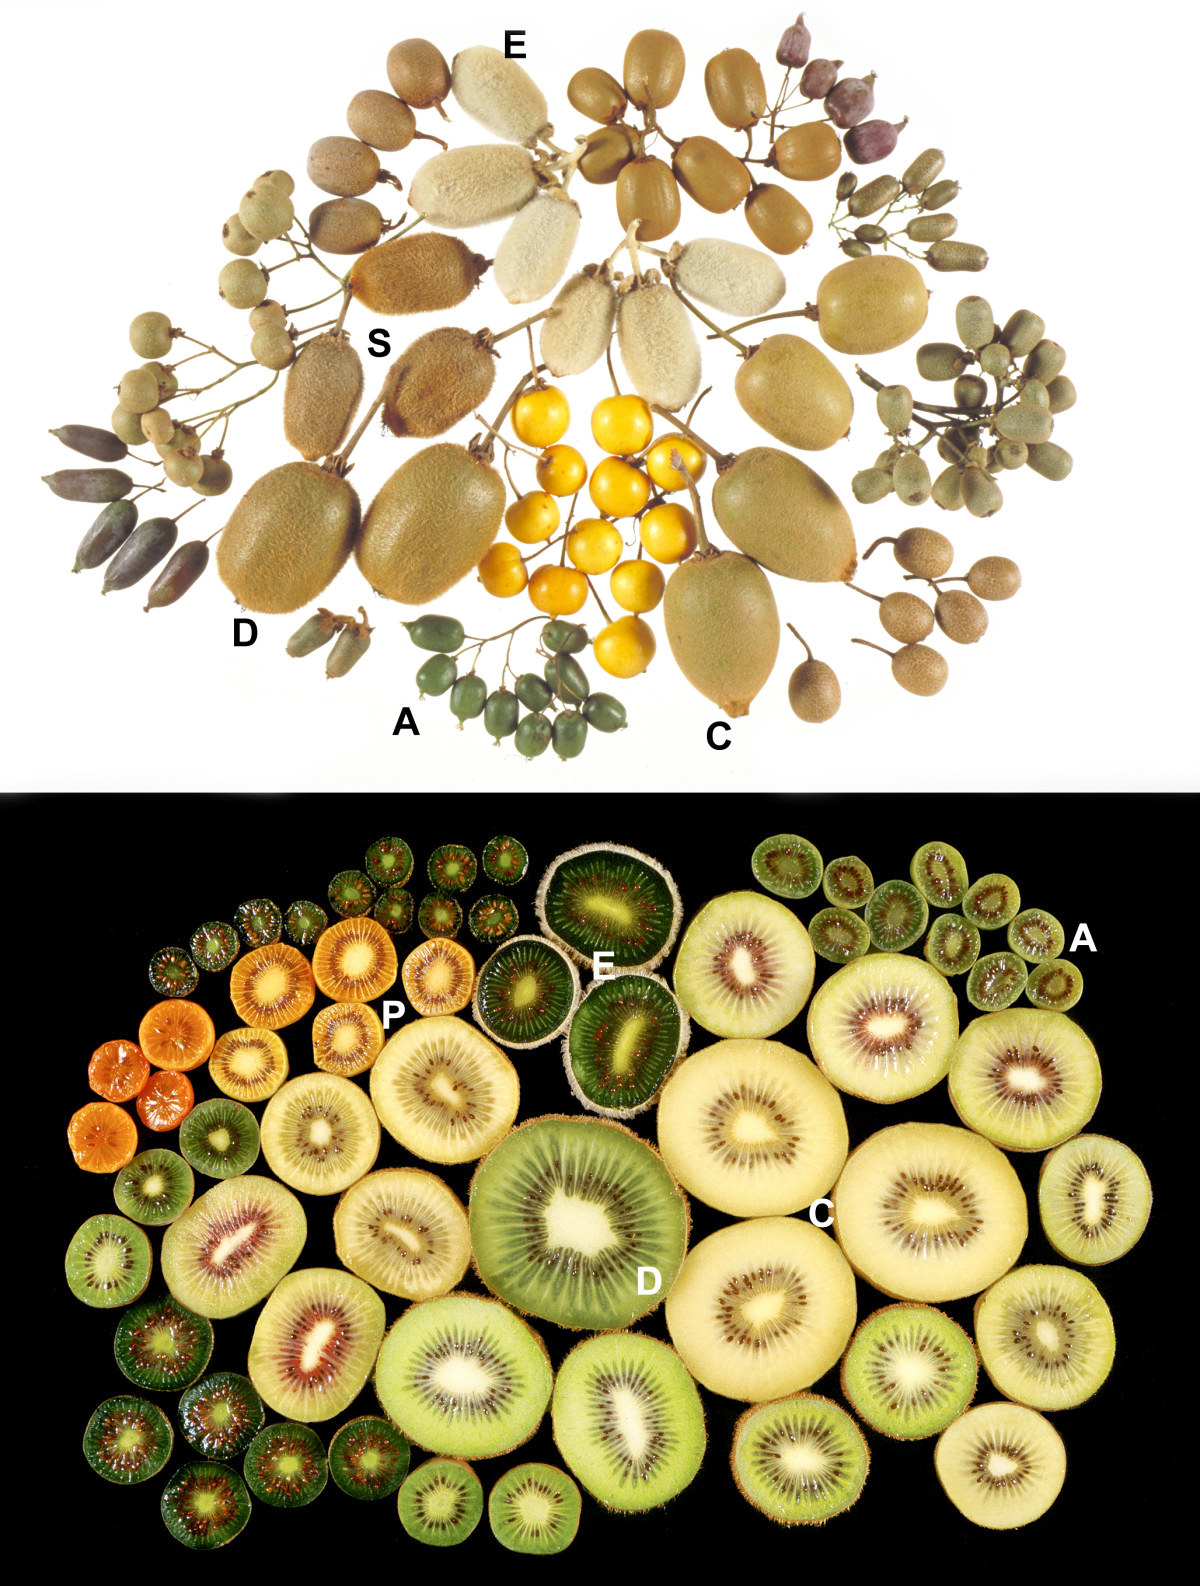 actinidia_fruits2.jpg